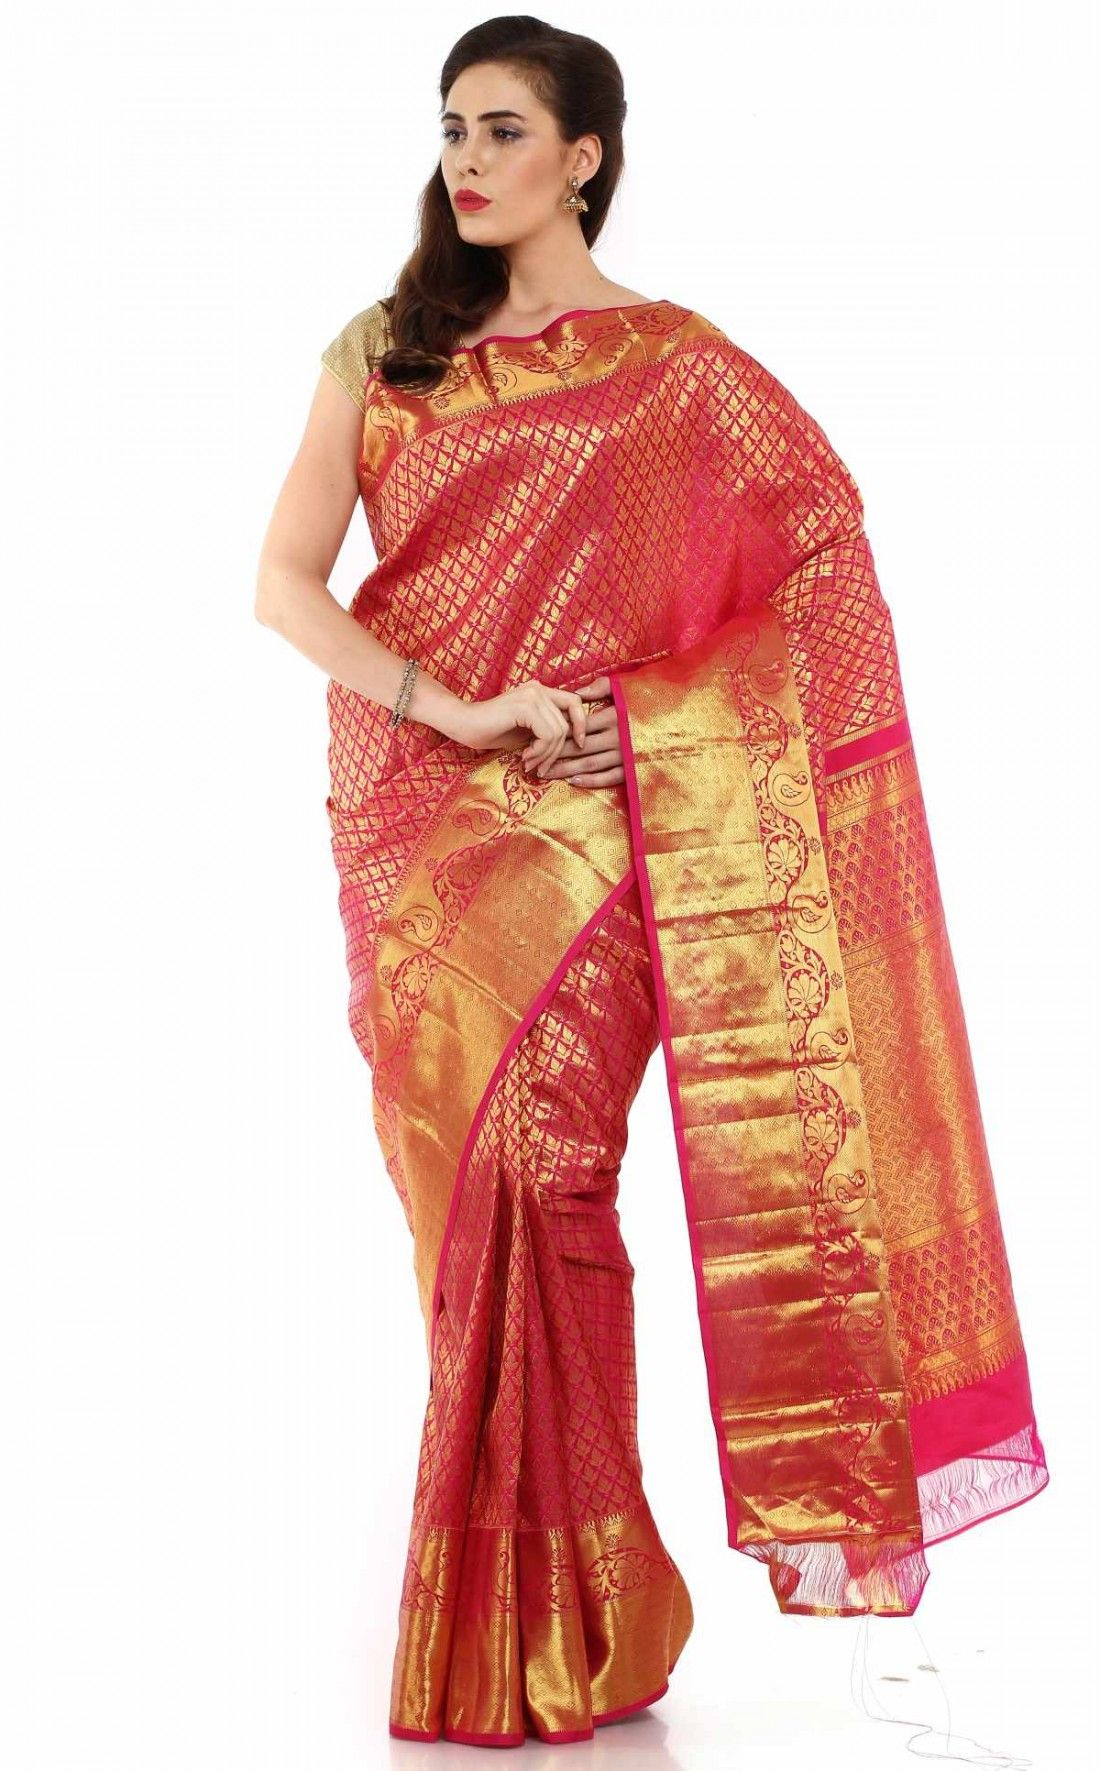 c05cab56cd KANJEEVARAM SILK DESIGNER SAREE-Beige-SAS19-VT-Silk - Kanchipuram Sarees -  Sarees - WOMENS